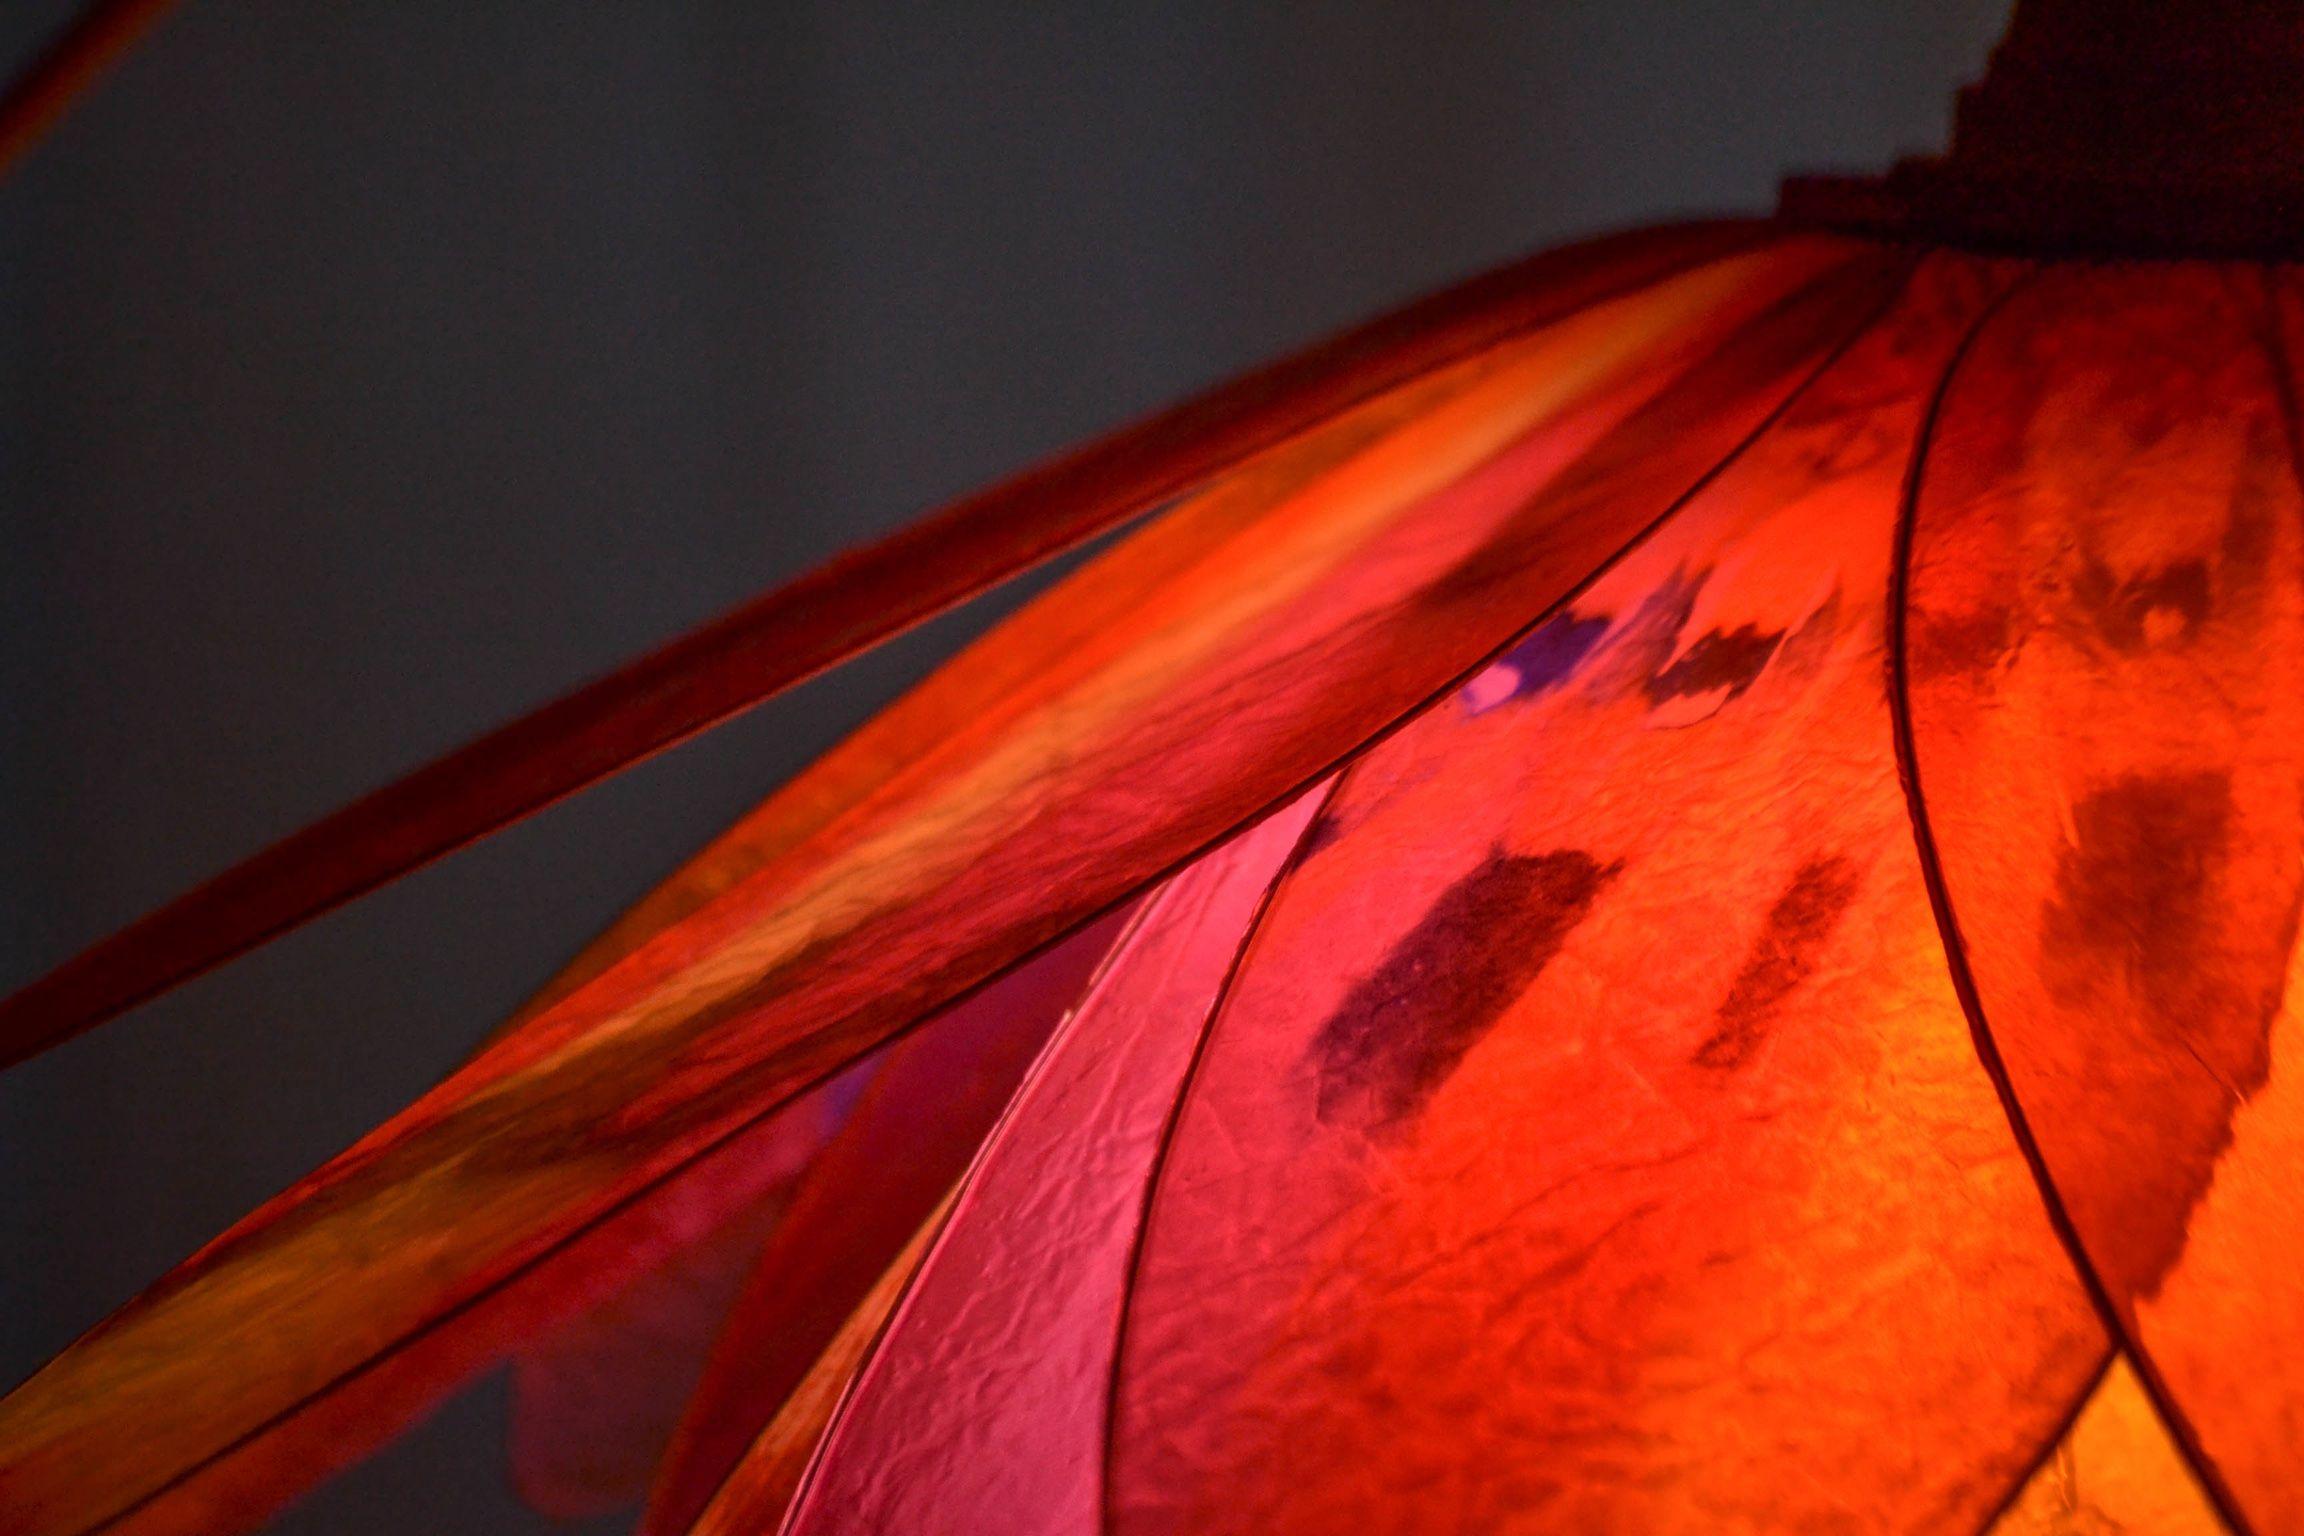 Lampadario rosso piccante. Fiori rossi, Lampadari, Fiori